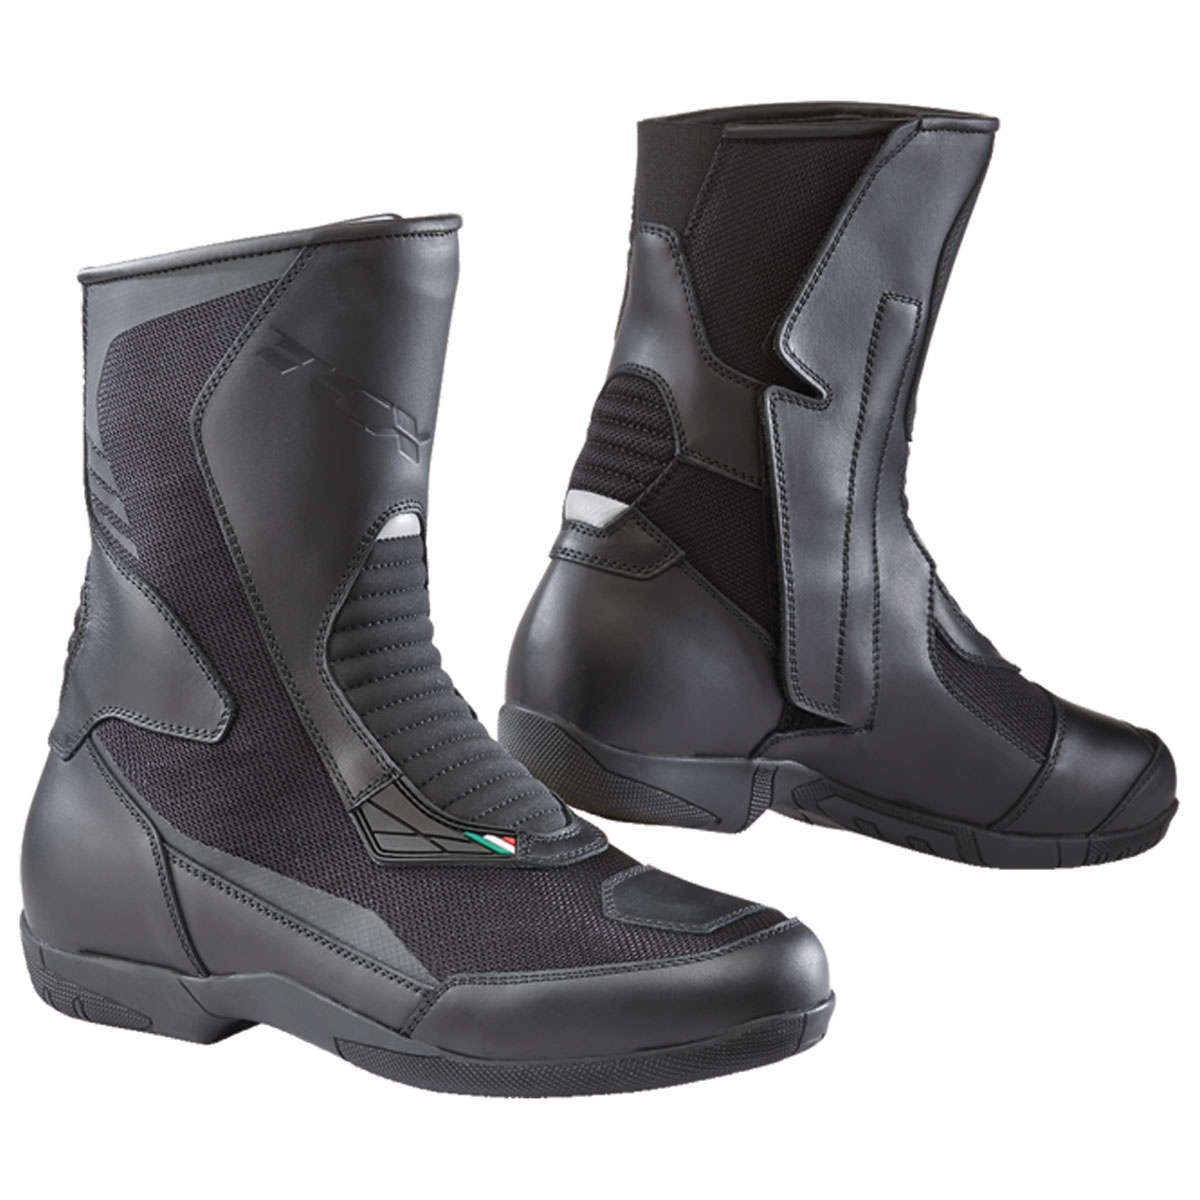 TCX Men's Zephyr Flow Black Boots